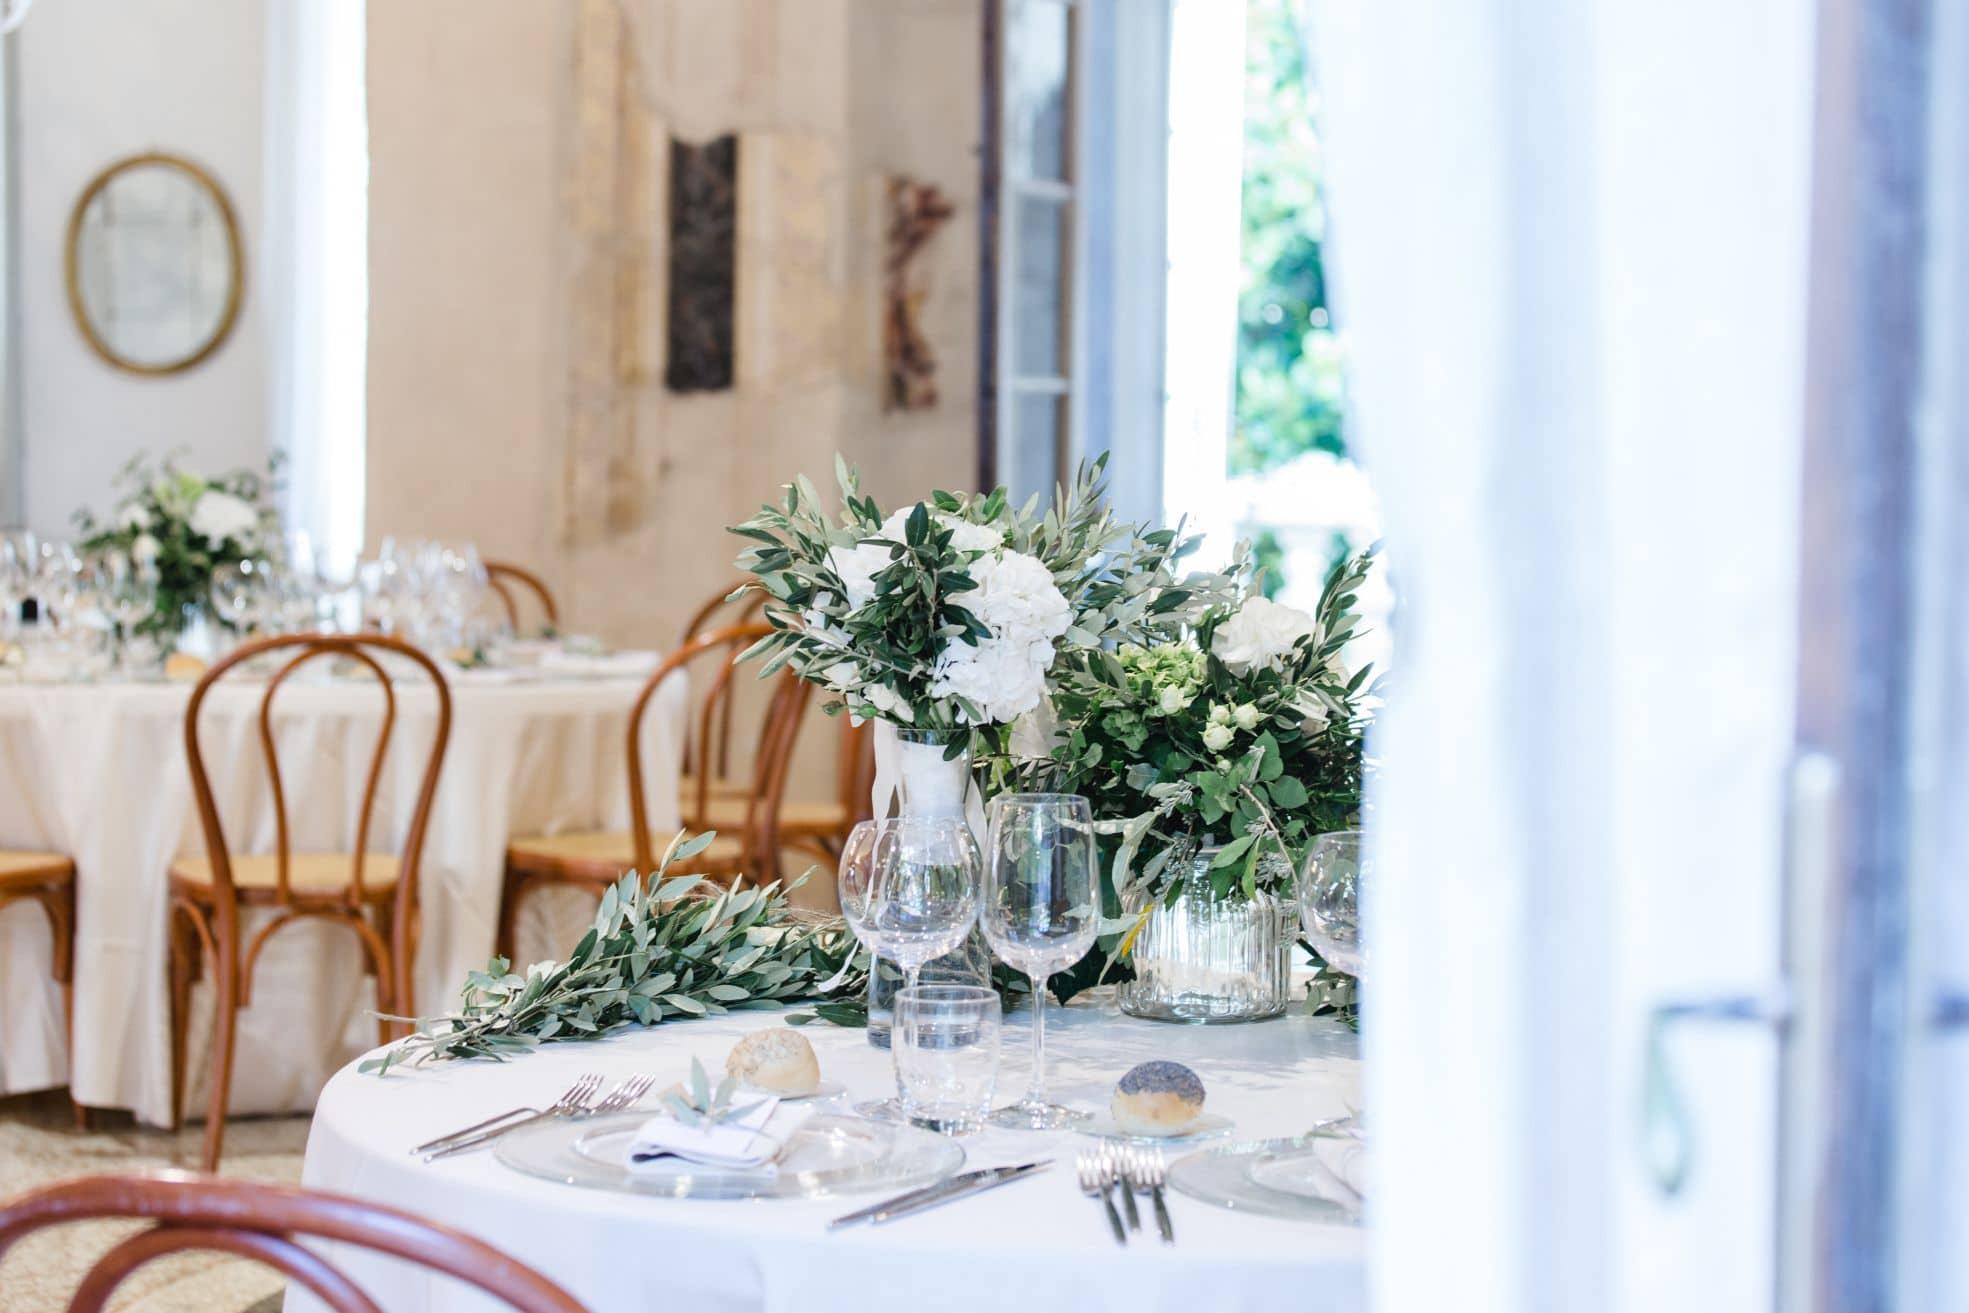 Million Memories_A&D_Hochzeitsfotograf_Schlosshochzeit_Toskana_Lago Di Como_Wedding_Tuscany_167